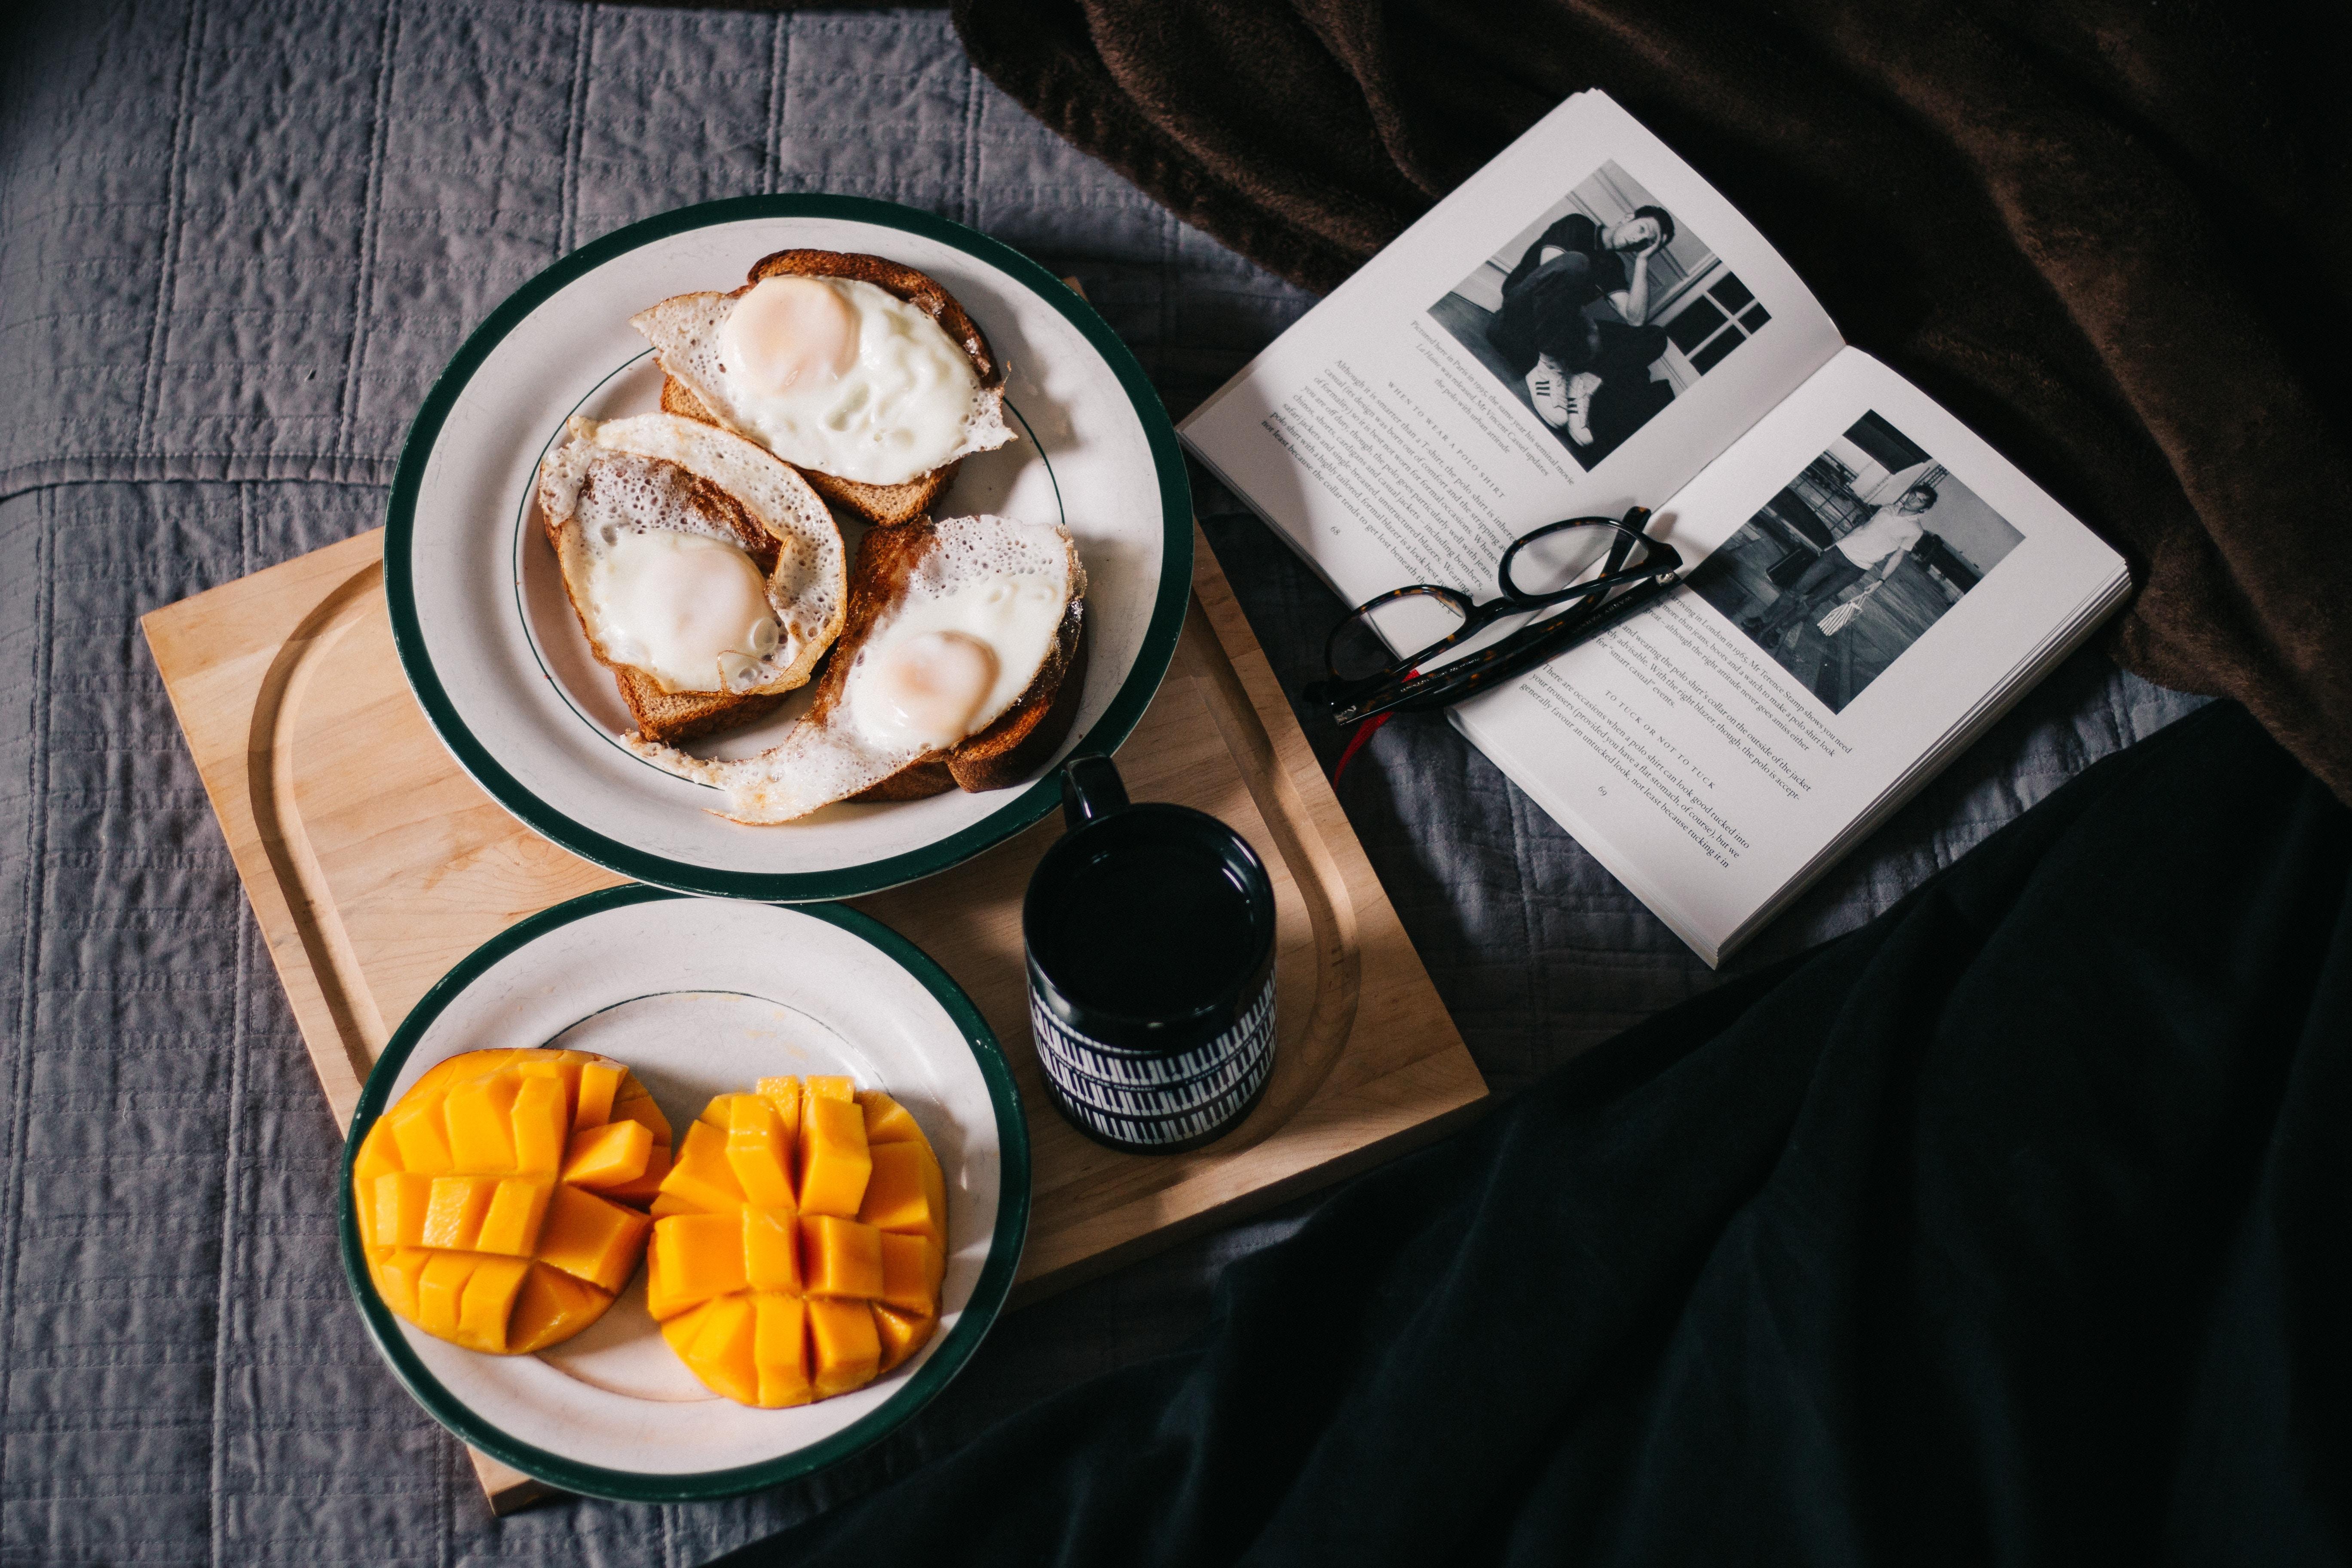 healthy breakfast unsplash david-lezcano-211888